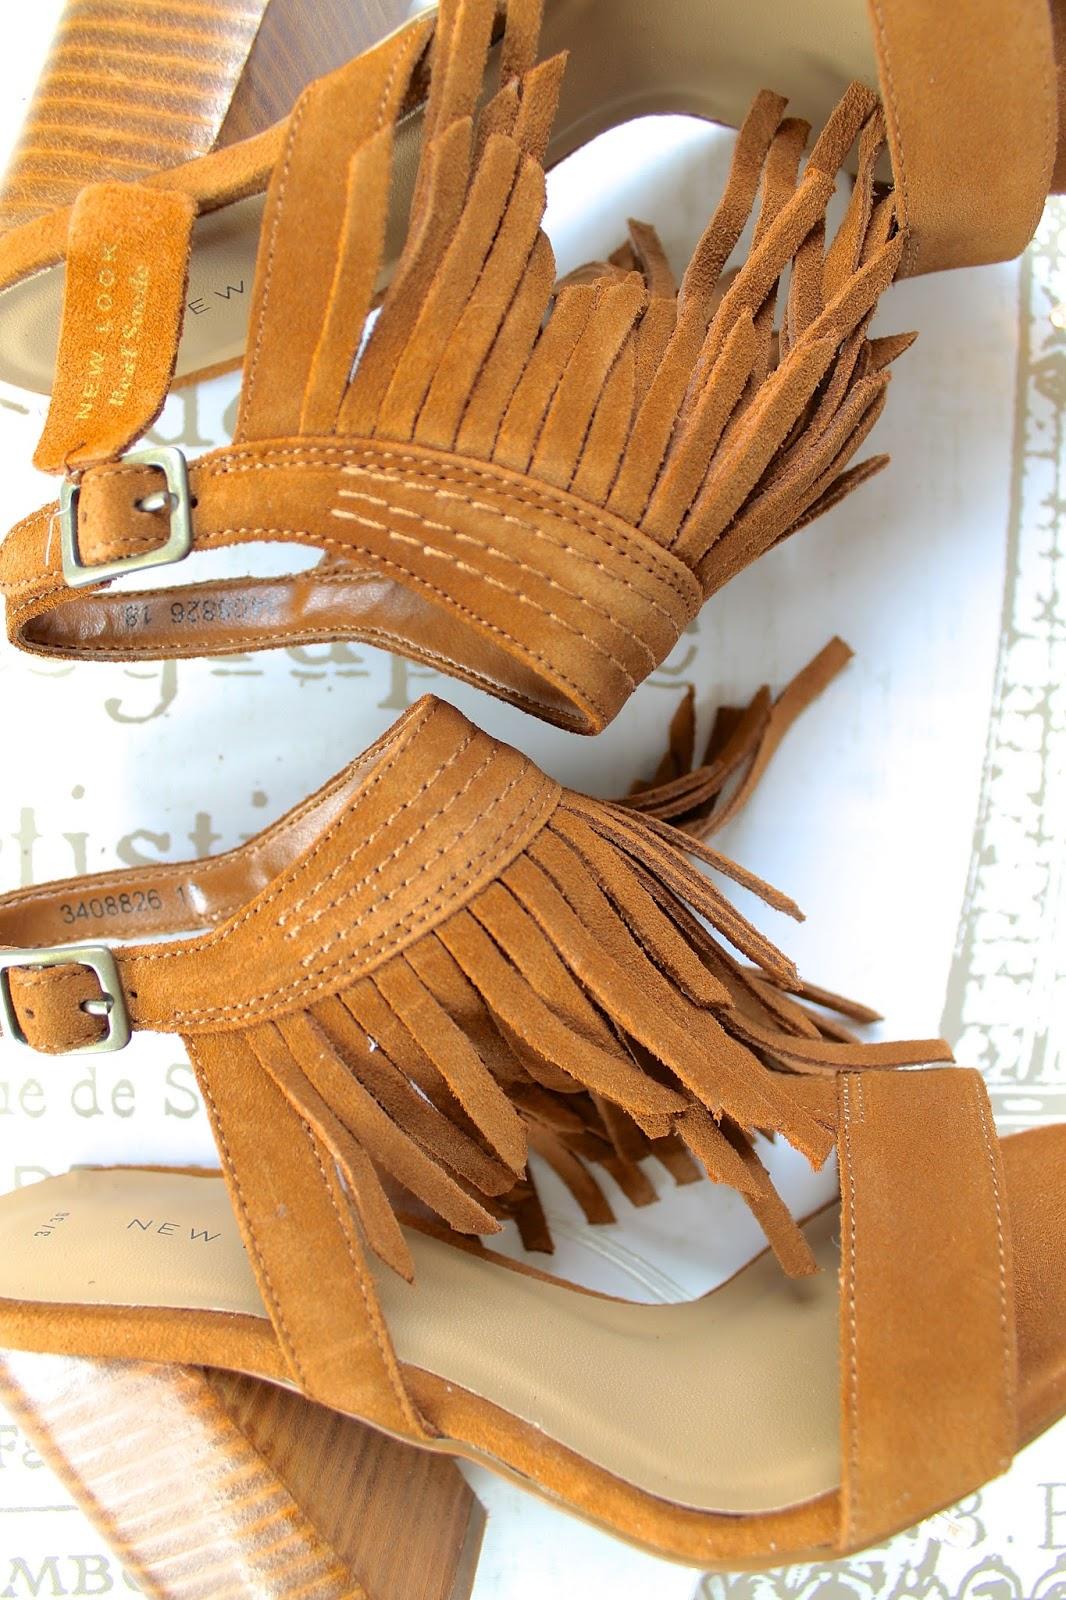 bec boop festival fashion fringed heels